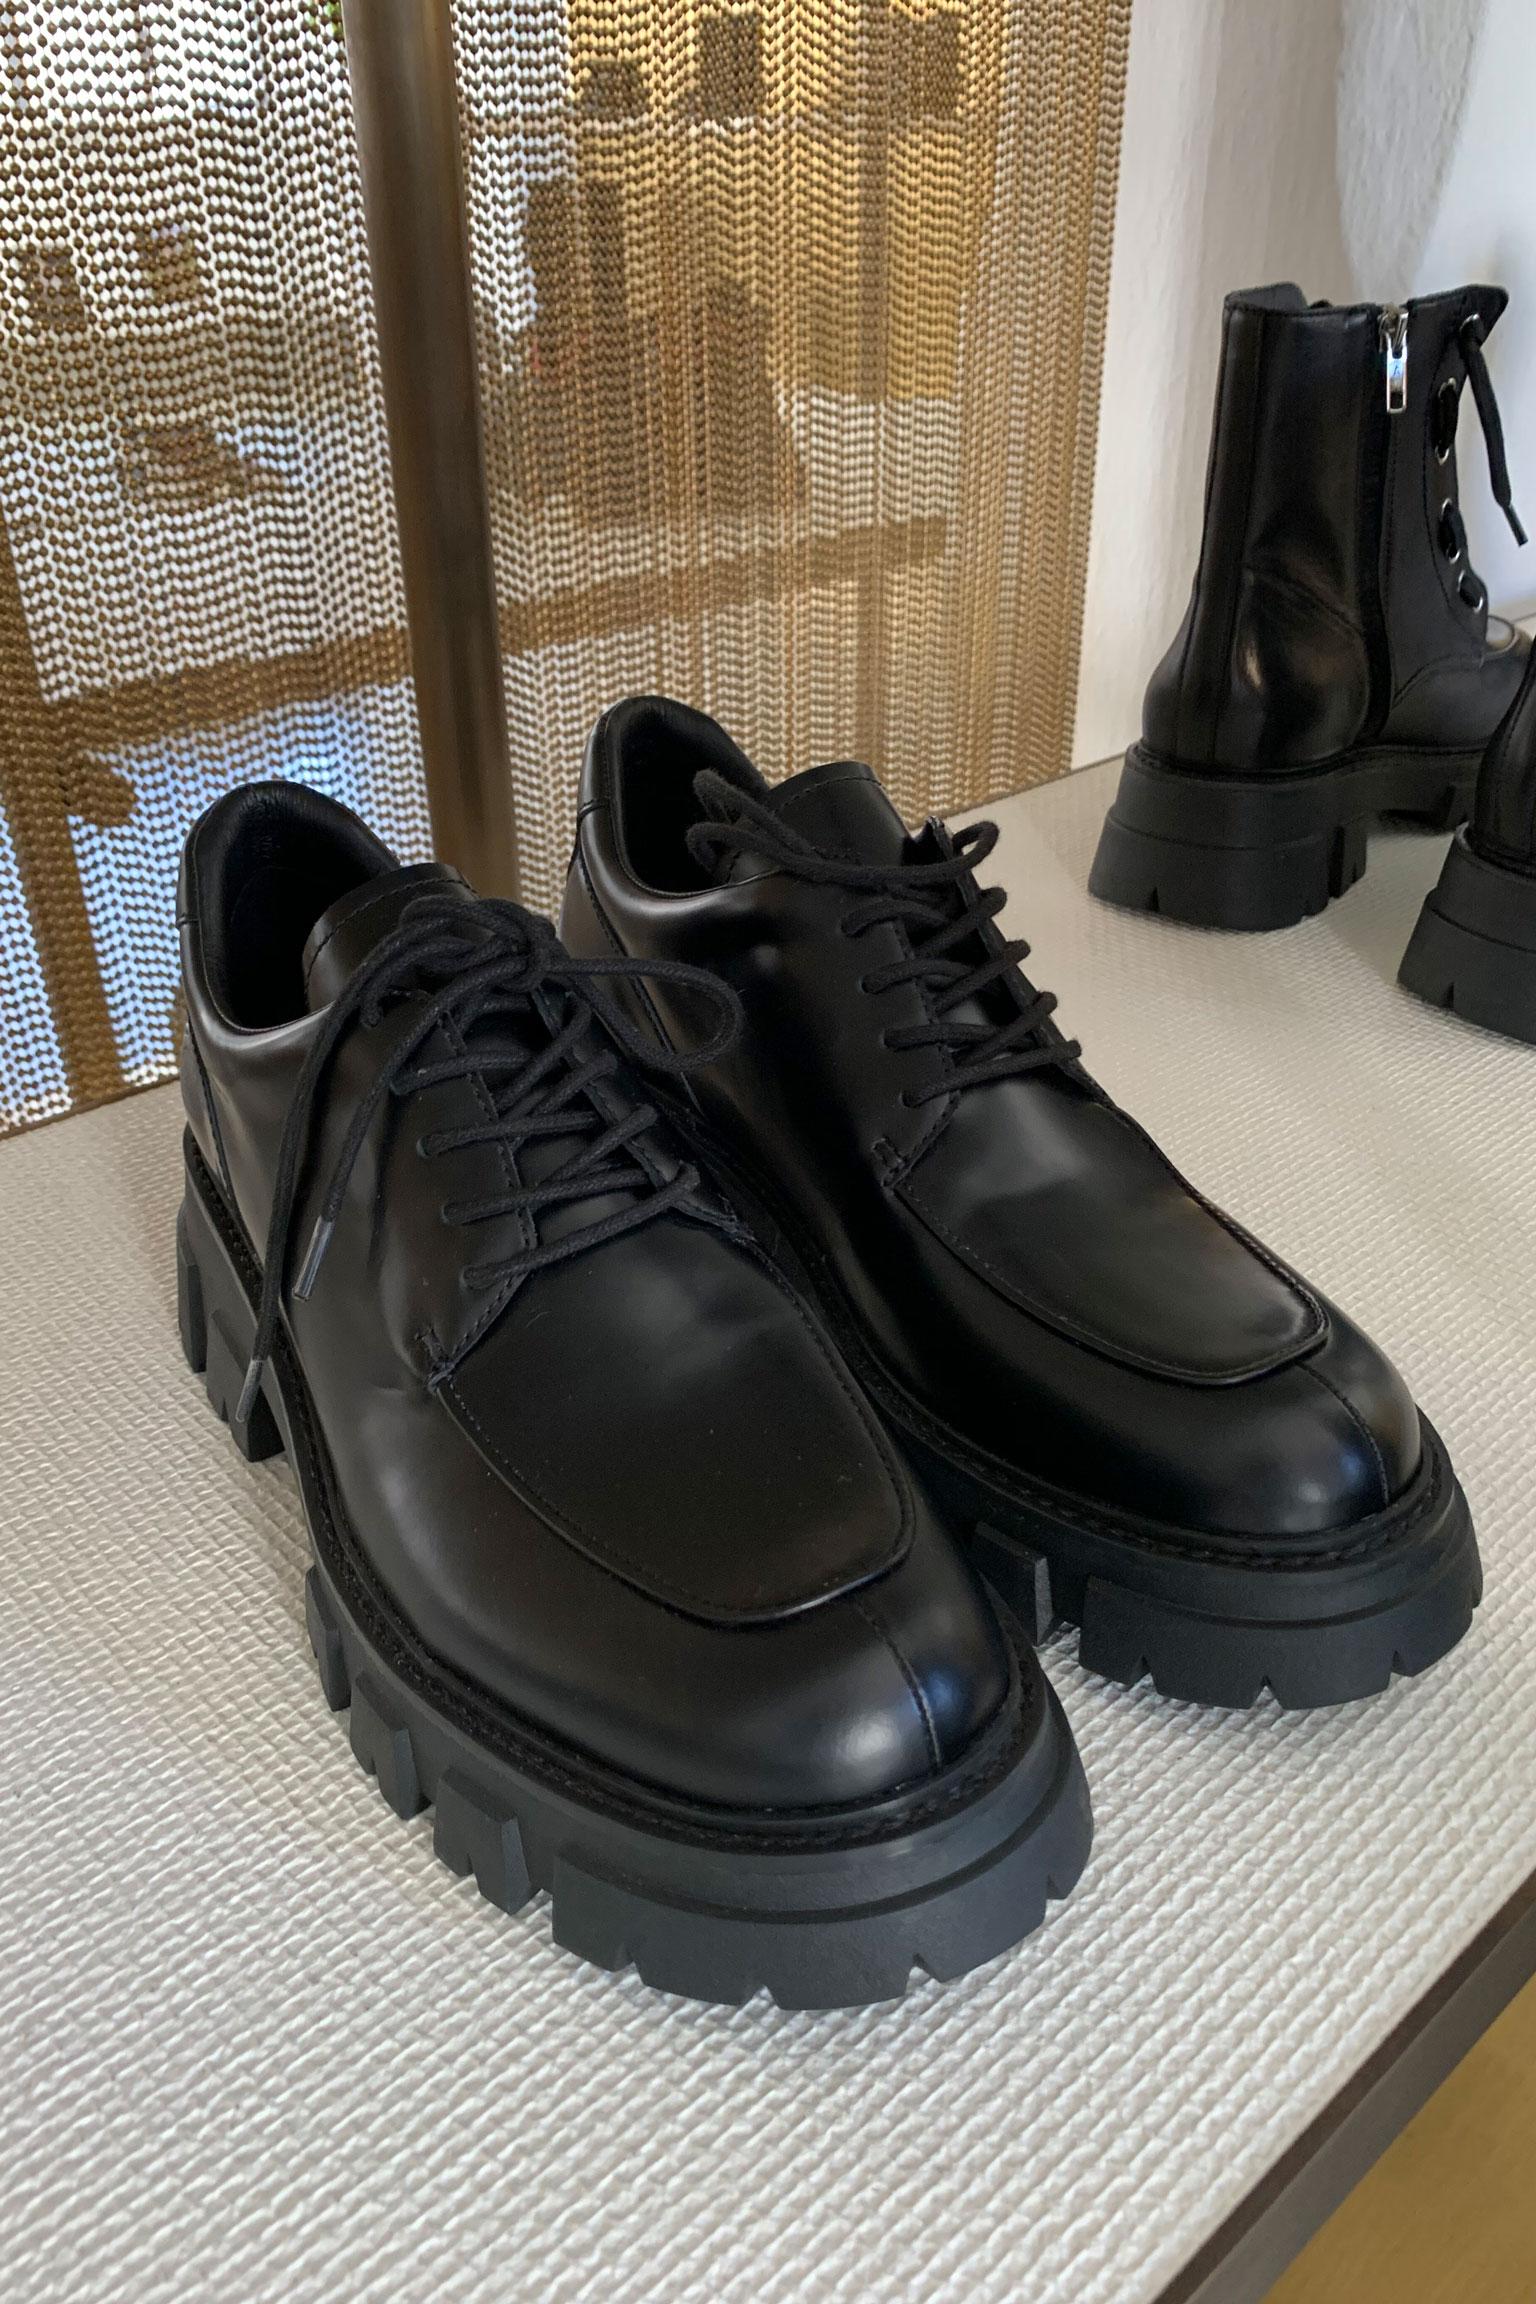 Dotz-scarpe-donna-nere-1